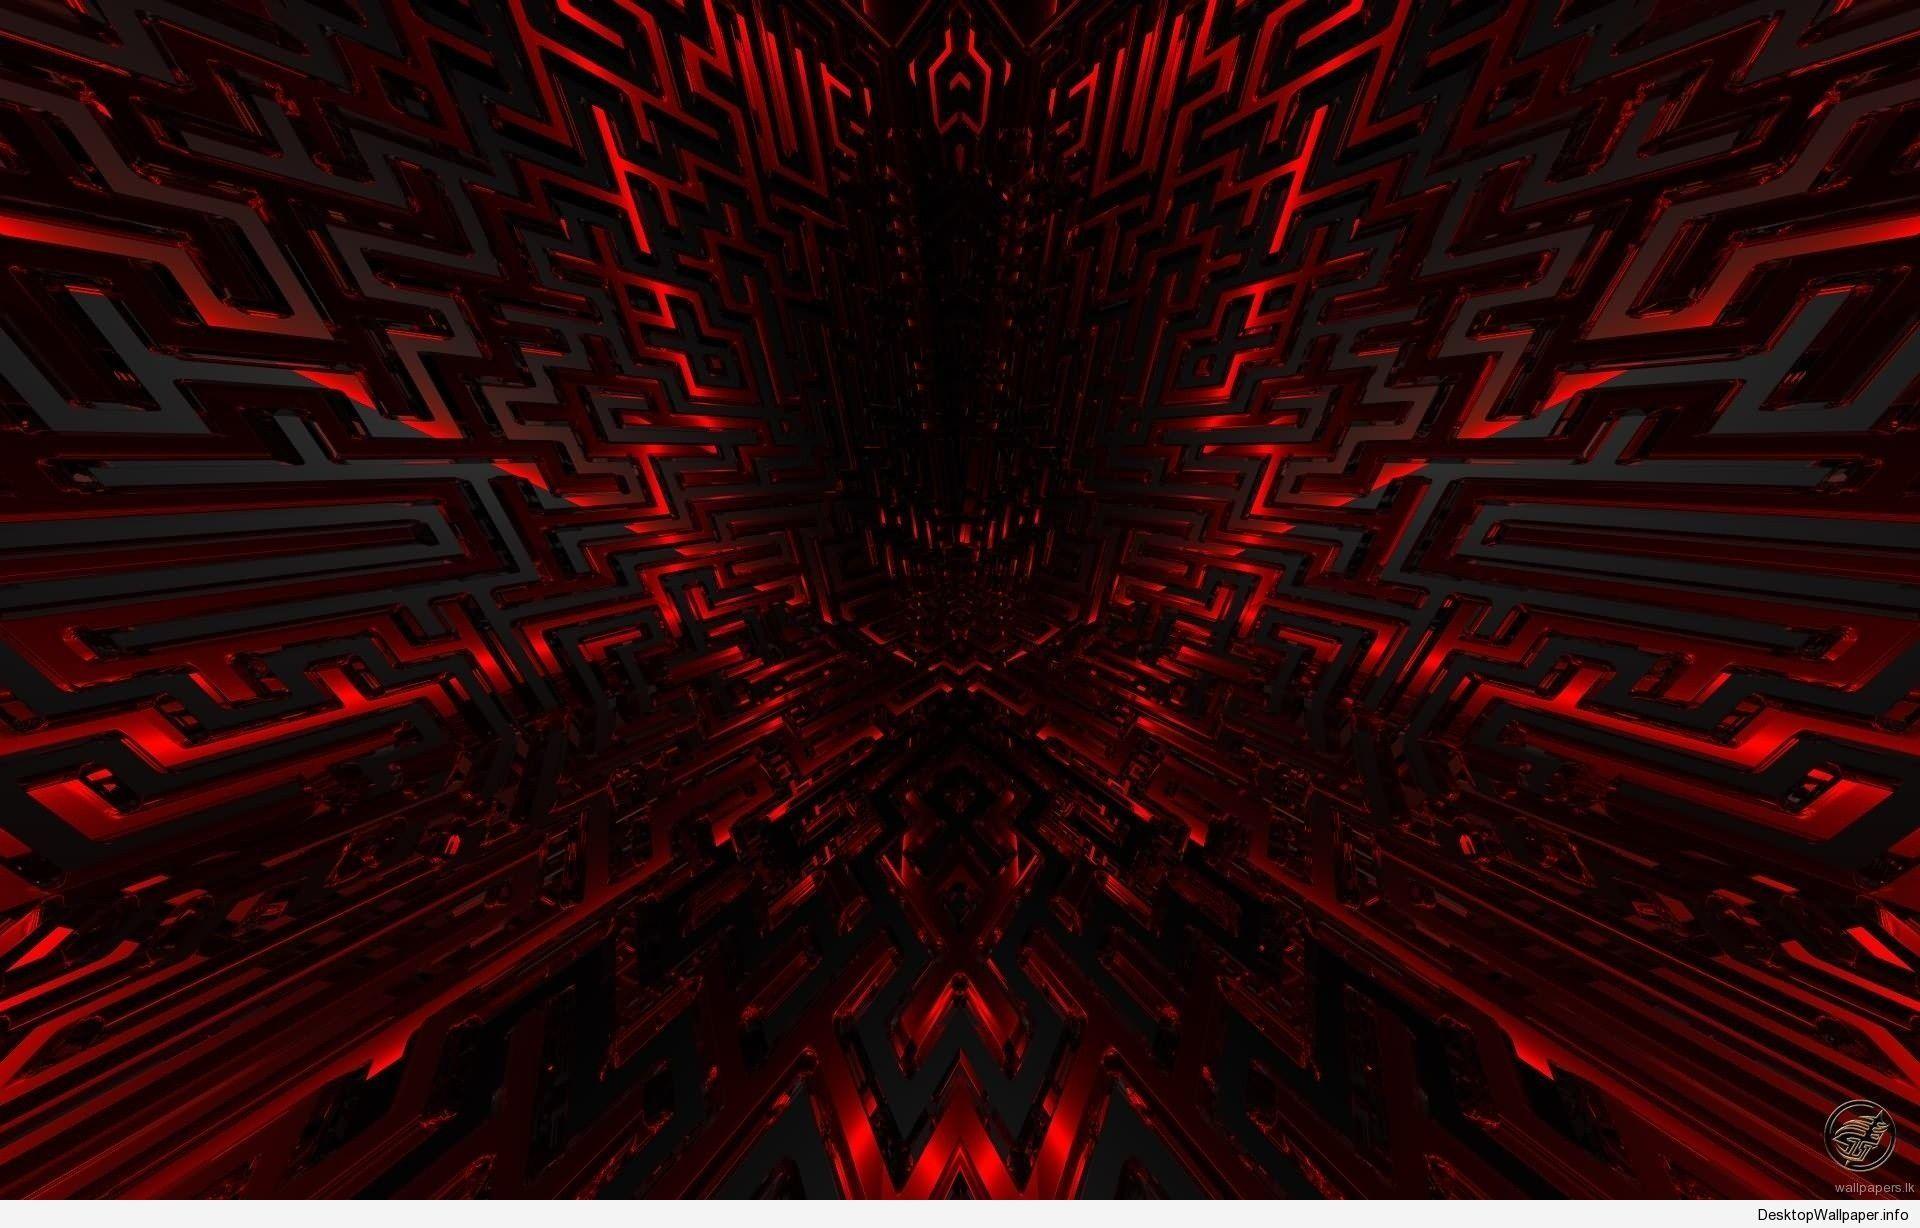 Black And Red Desktop Wallpaper Http Desktopwallpaper Info Black And Red Desktop Wallpaper 6 Red And Black Wallpaper Red Wallpaper Red And Black Background